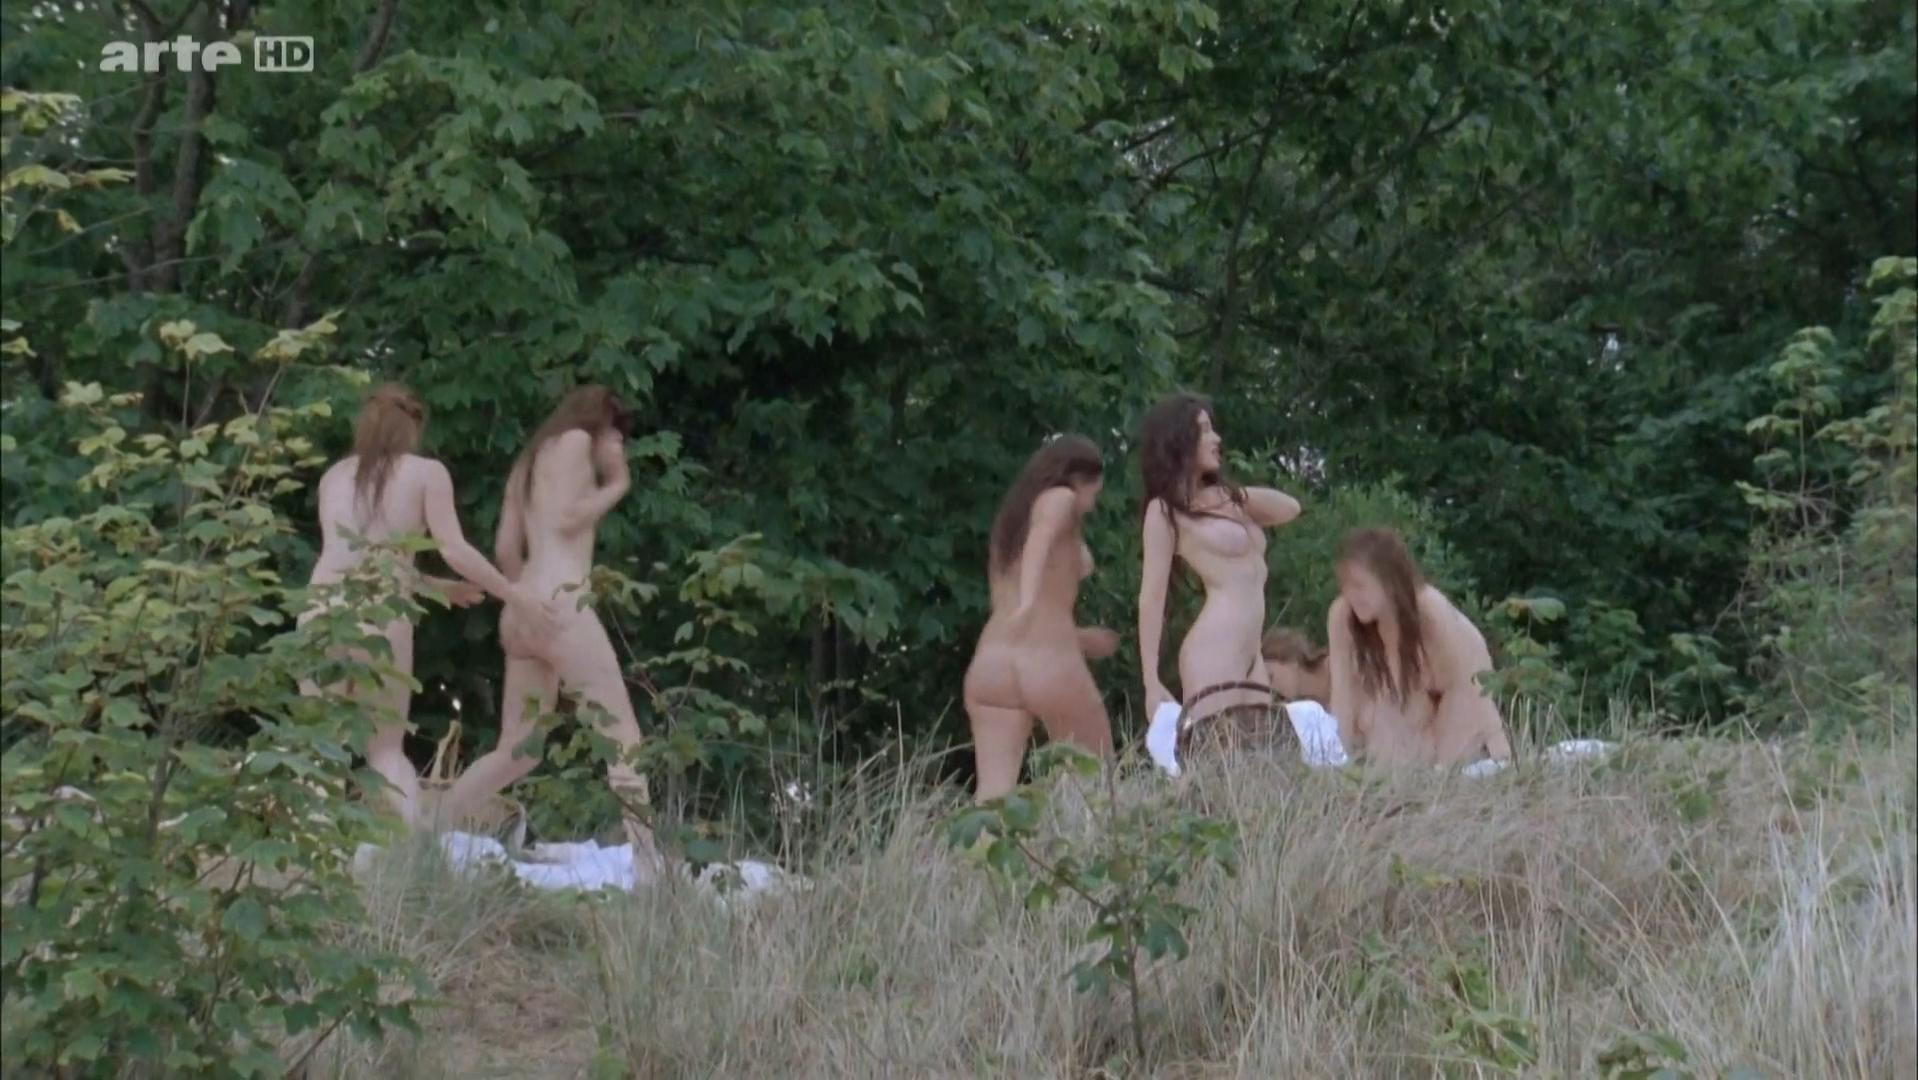 image Leisha hailey nude fertile ground 2010